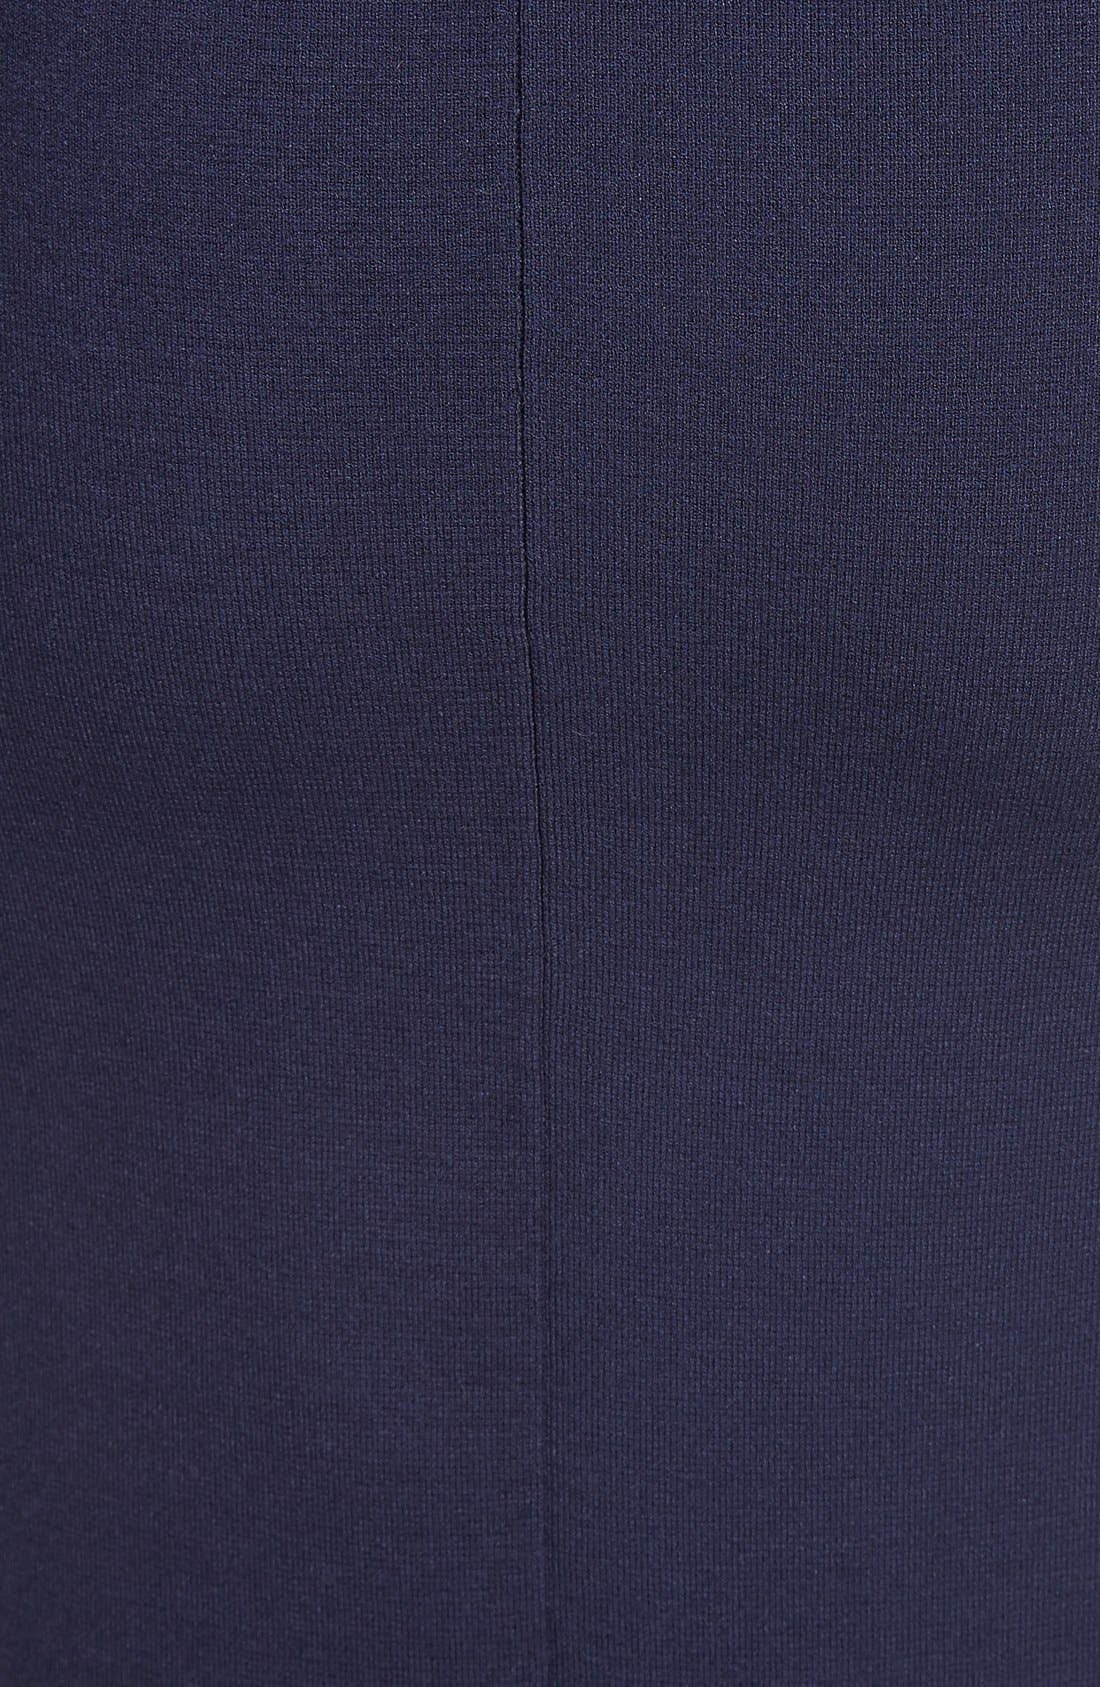 Stretch Knit Pencil Skirt,                             Alternate thumbnail 6, color,                             Navy